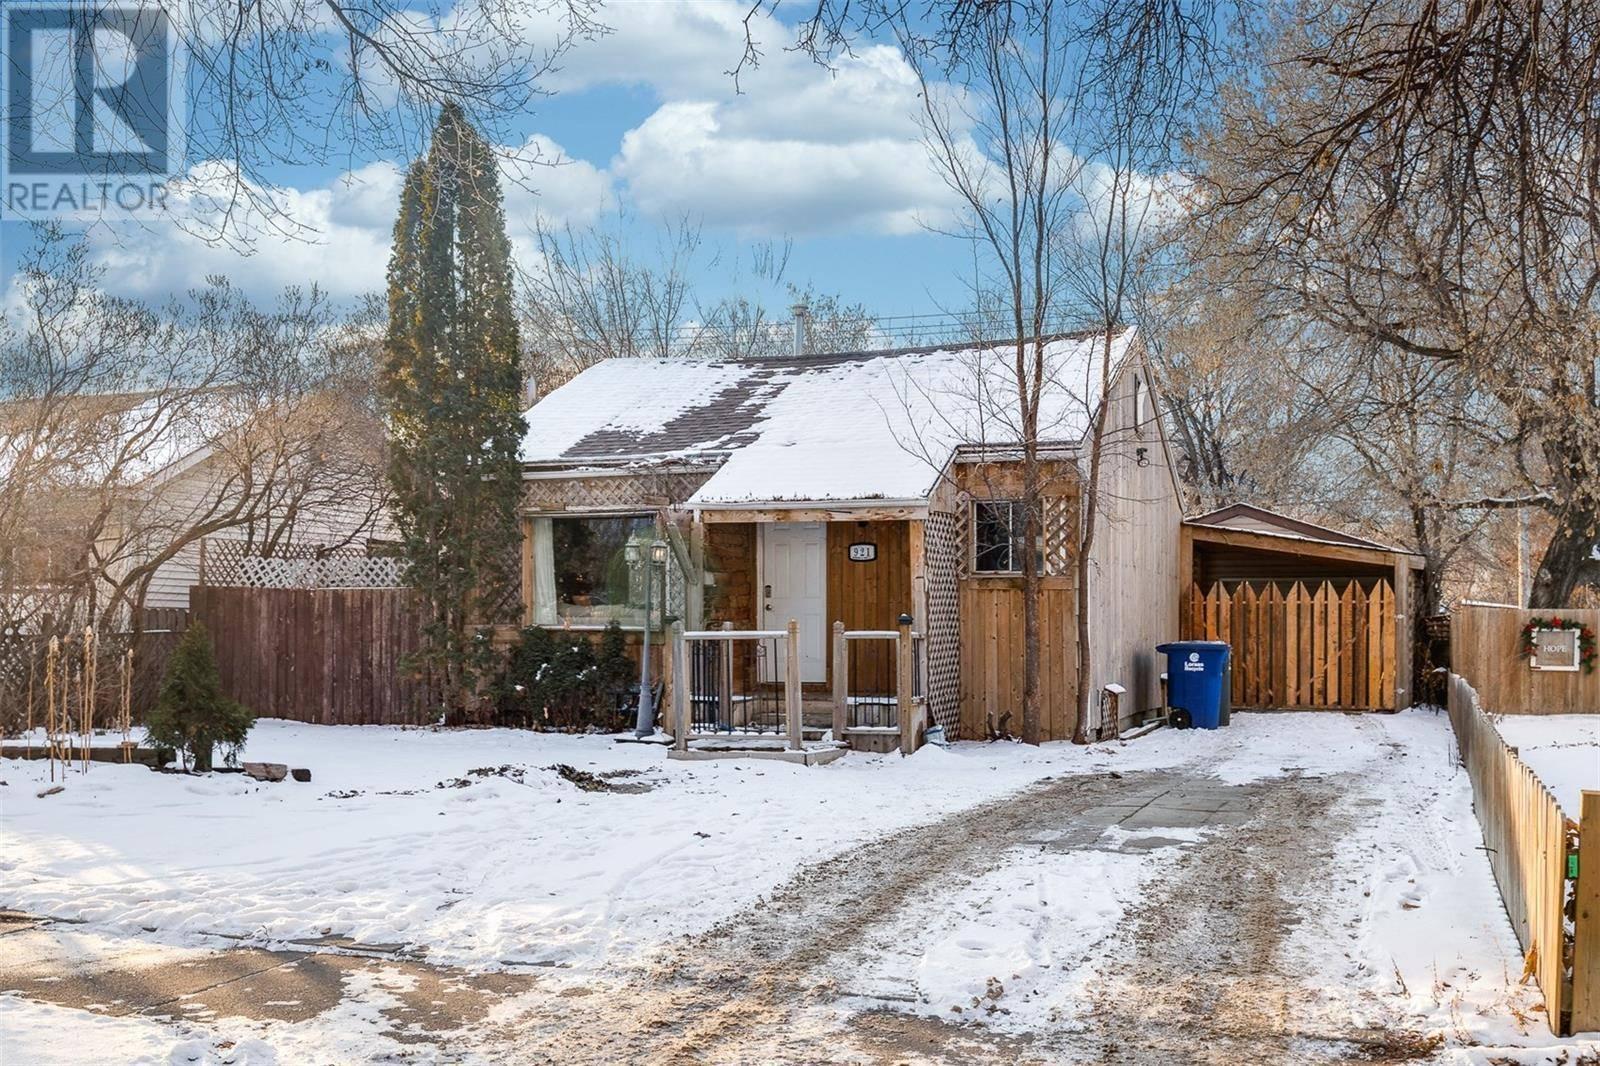 House for sale at 921 I Ave N Saskatoon Saskatchewan - MLS: SK793400